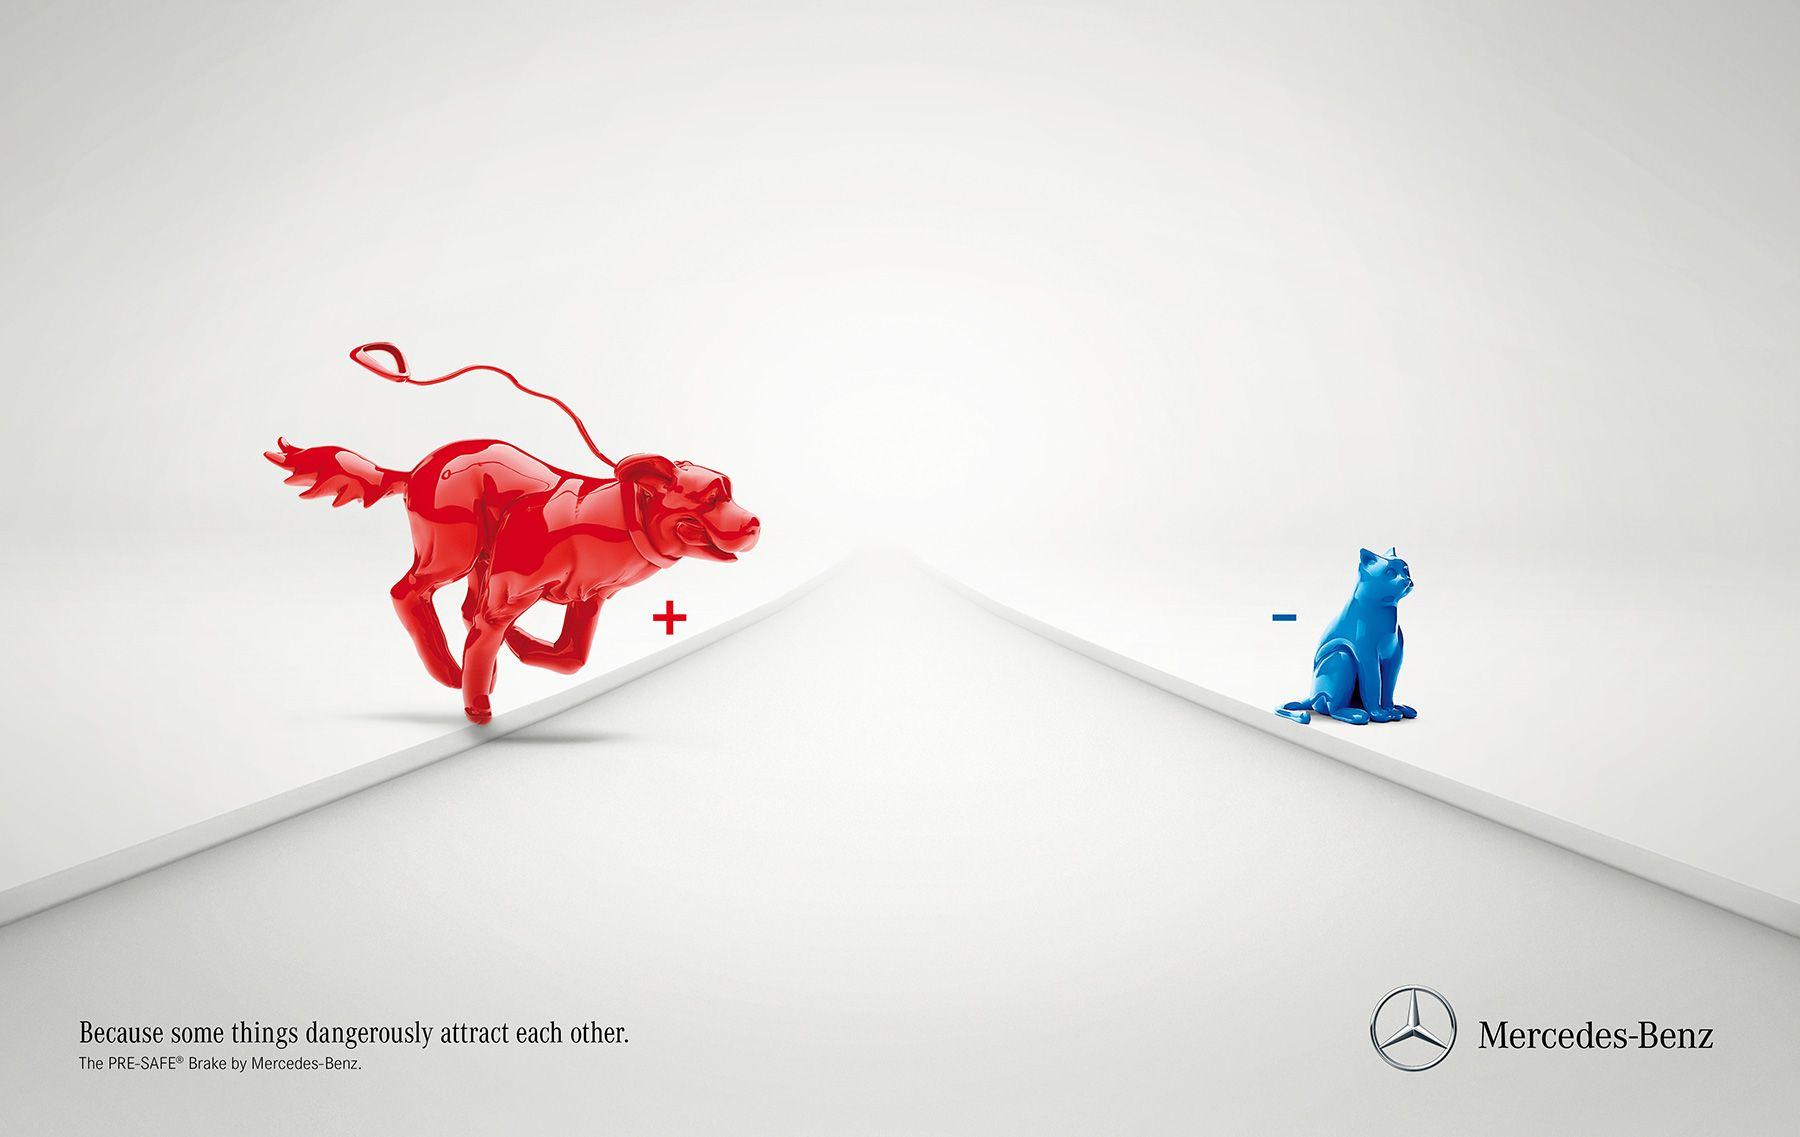 #advertising #announcement #notice #poster #idea #creativity #artdirection #ads #adv #marketing #print #campaign